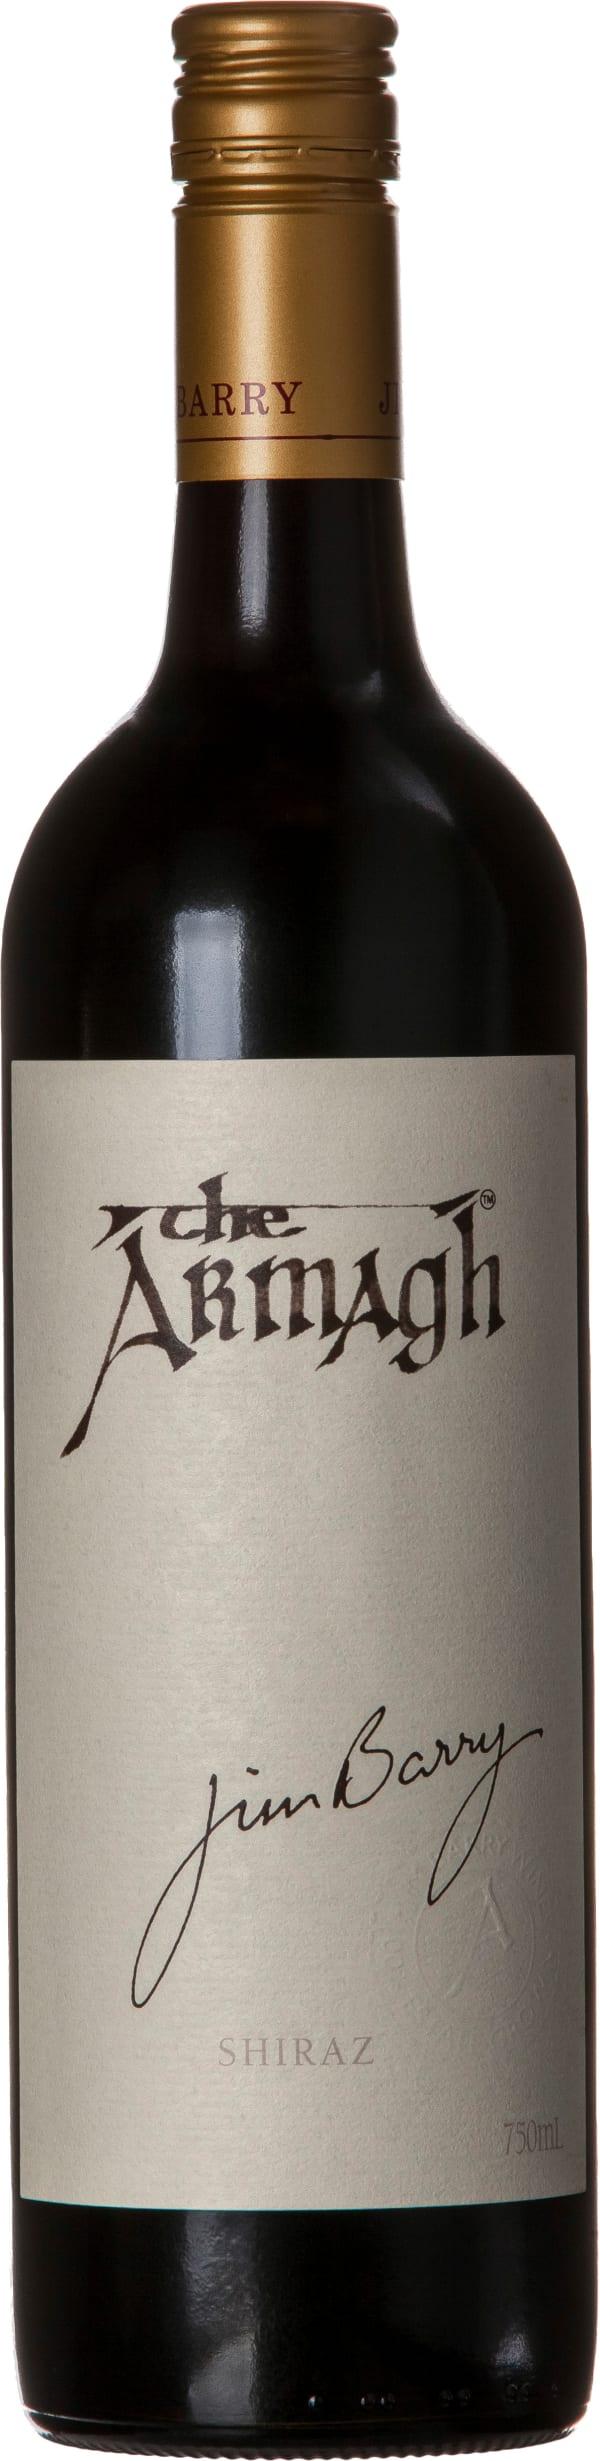 Jim Barry The Armagh Shiraz 2014